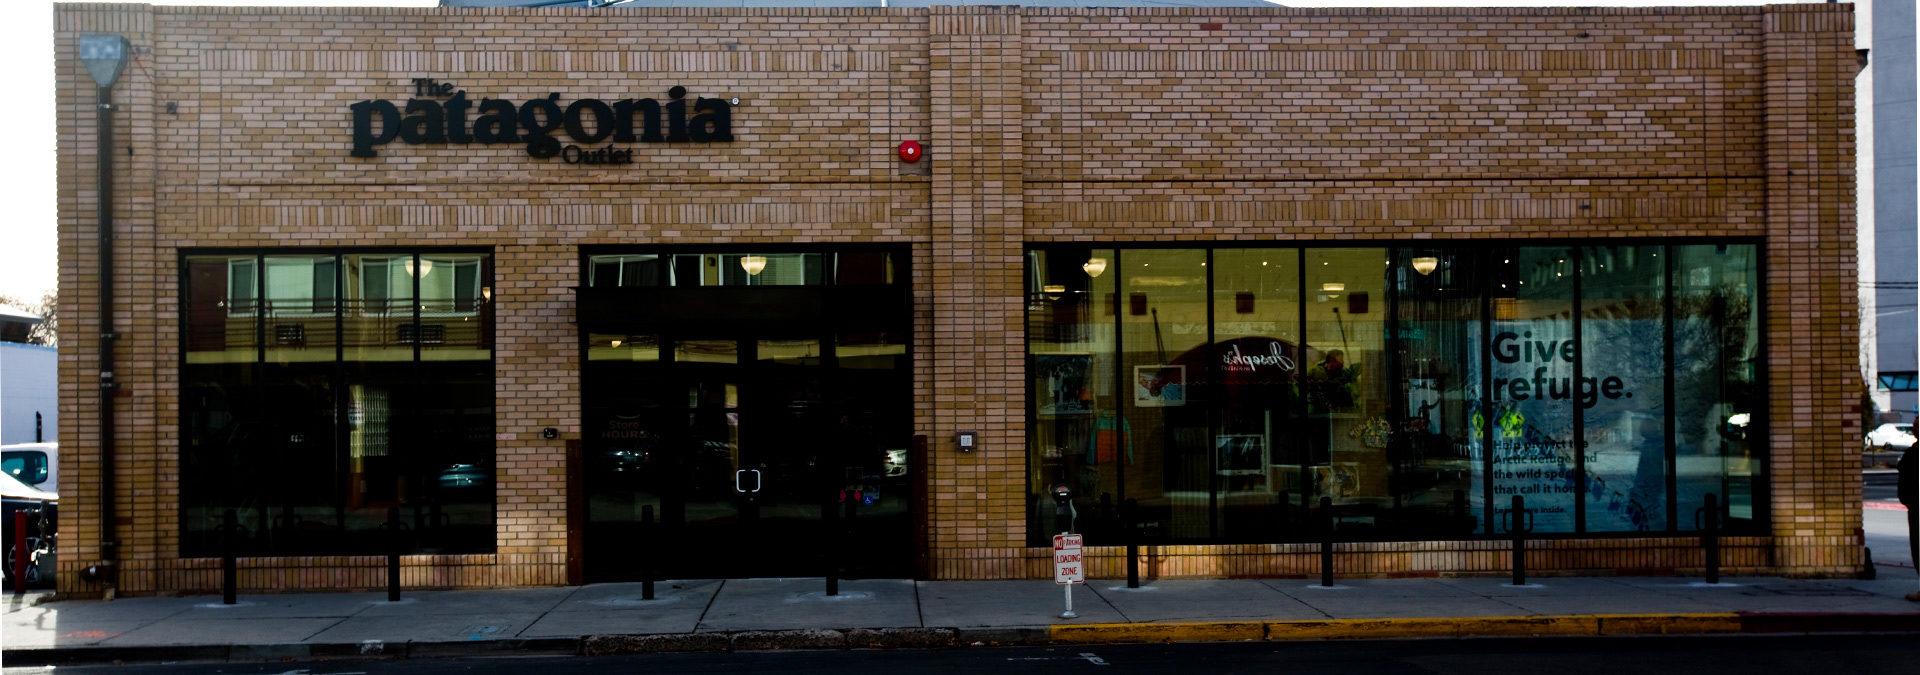 Patagonia Store Exterior 700x400 shopping